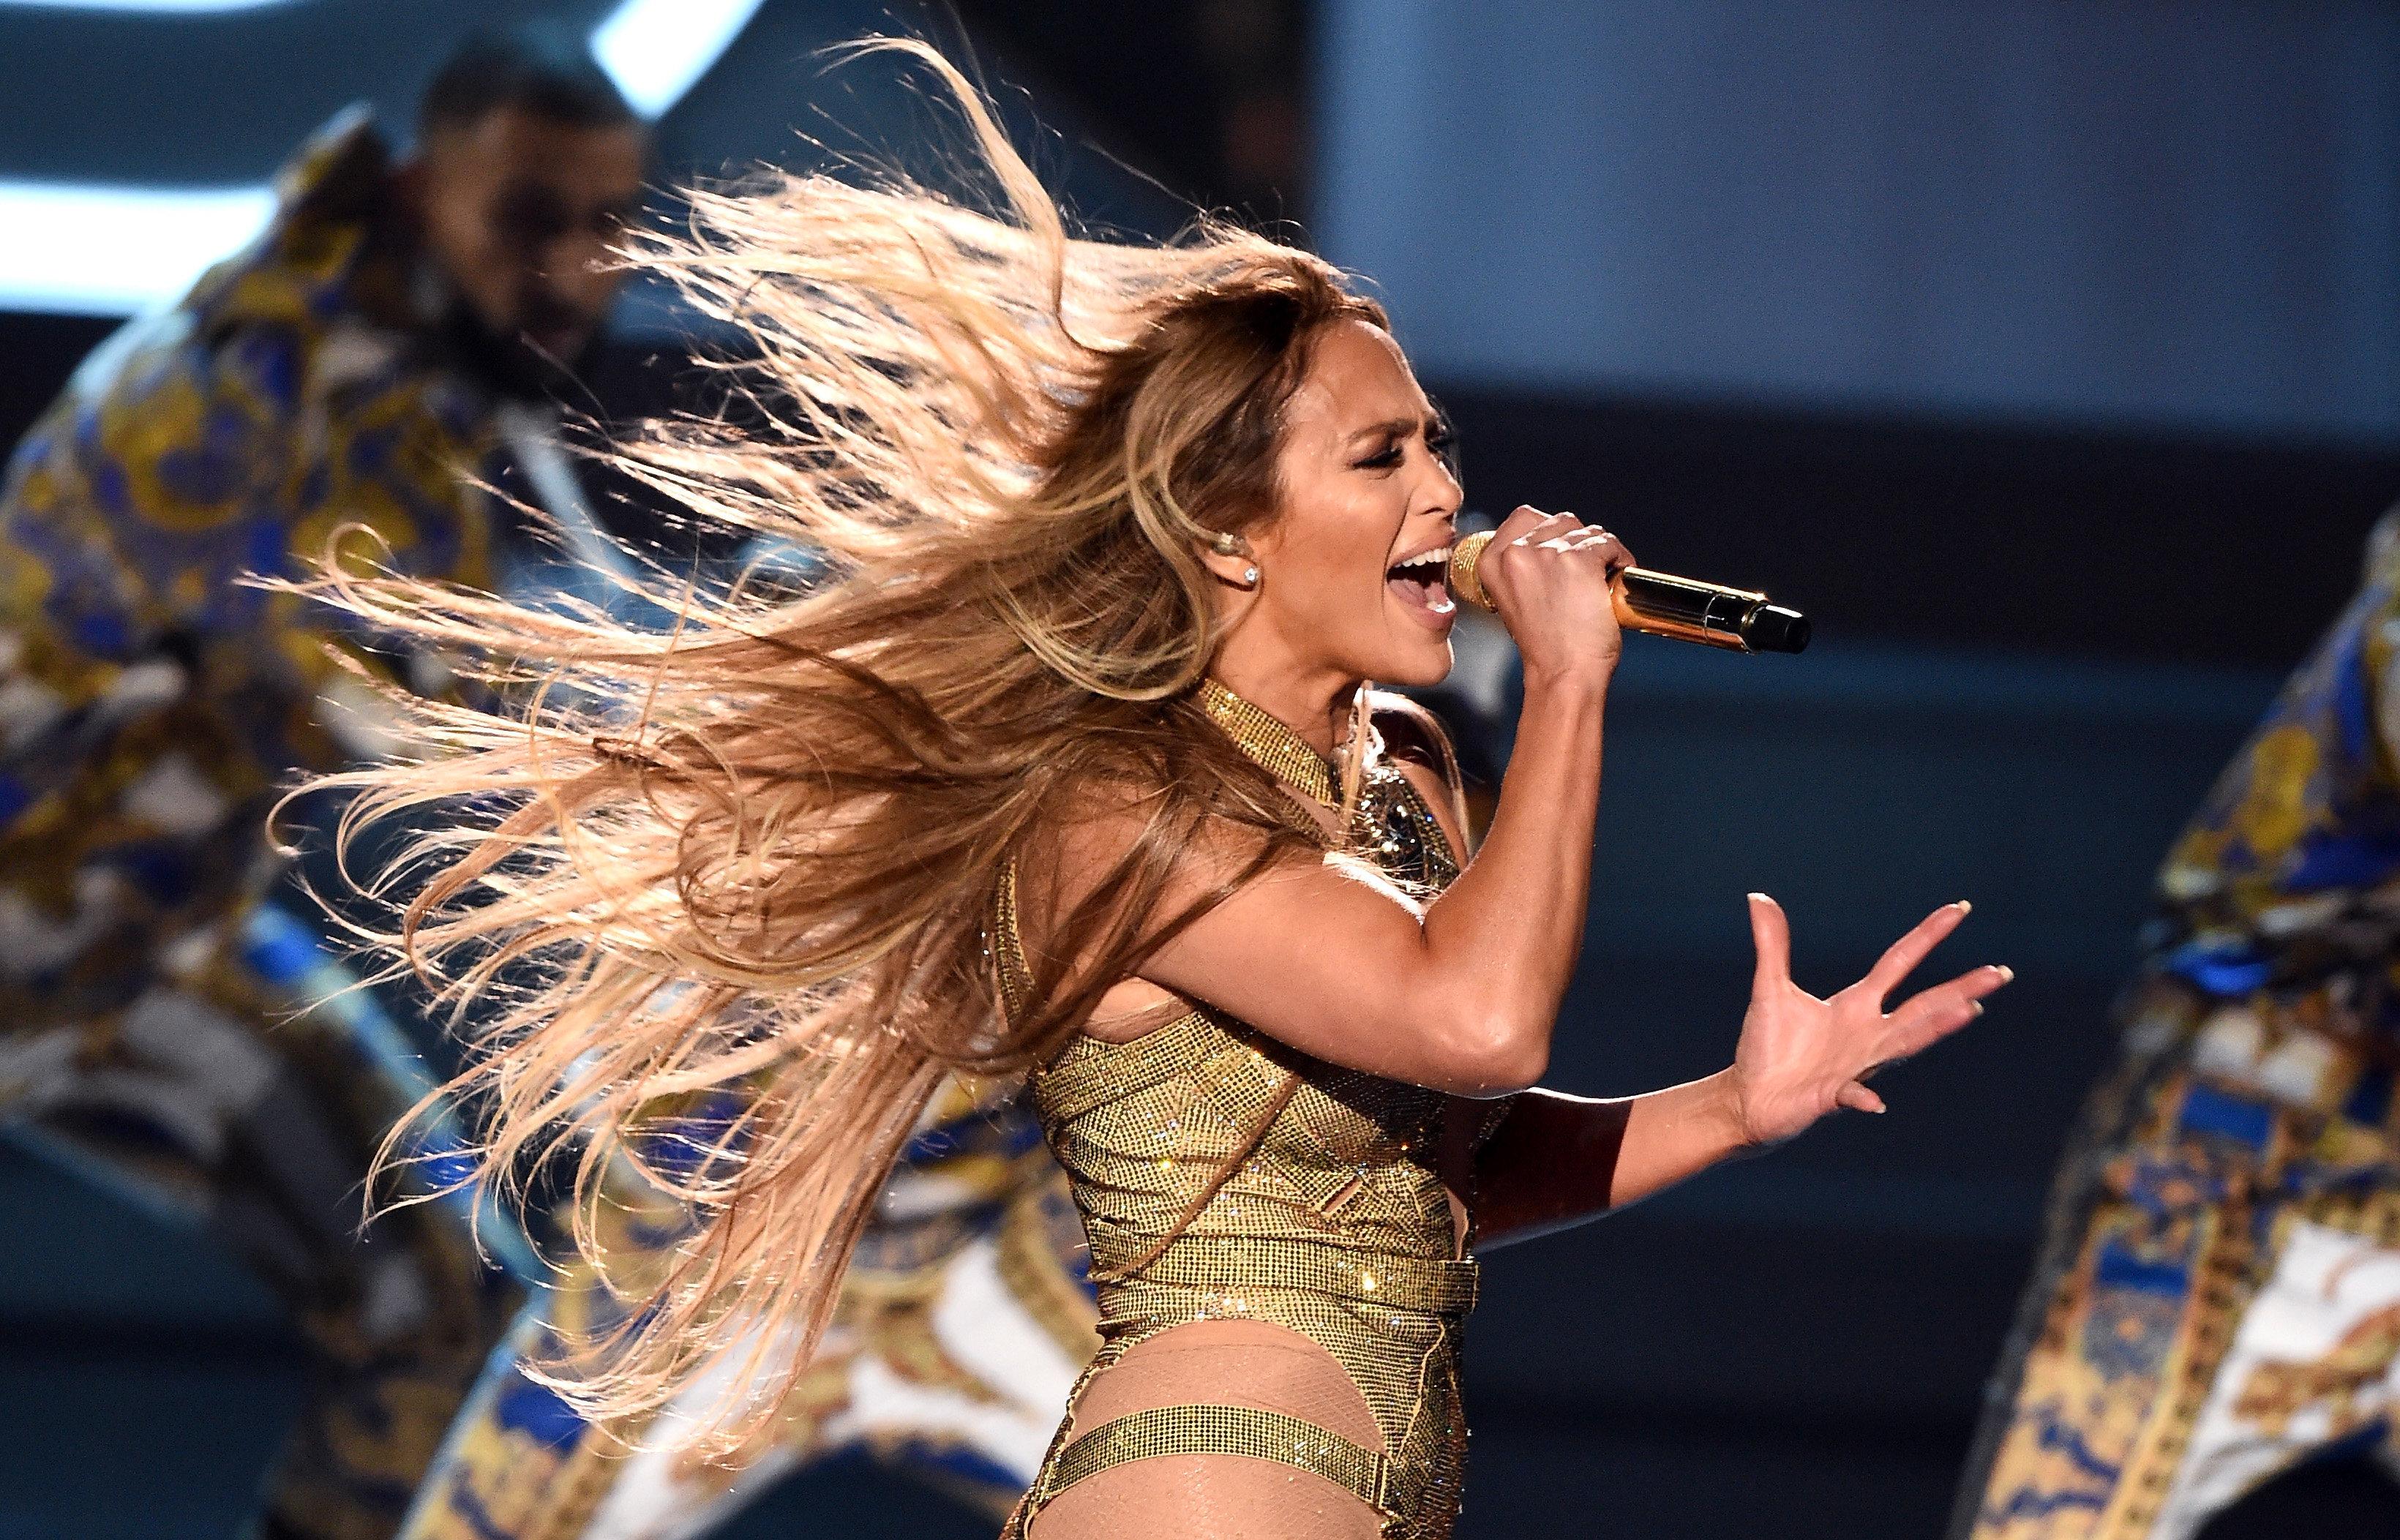 Jennifer Lopez Shuts Down The 2018 MTV VMAs With Vanguard Award